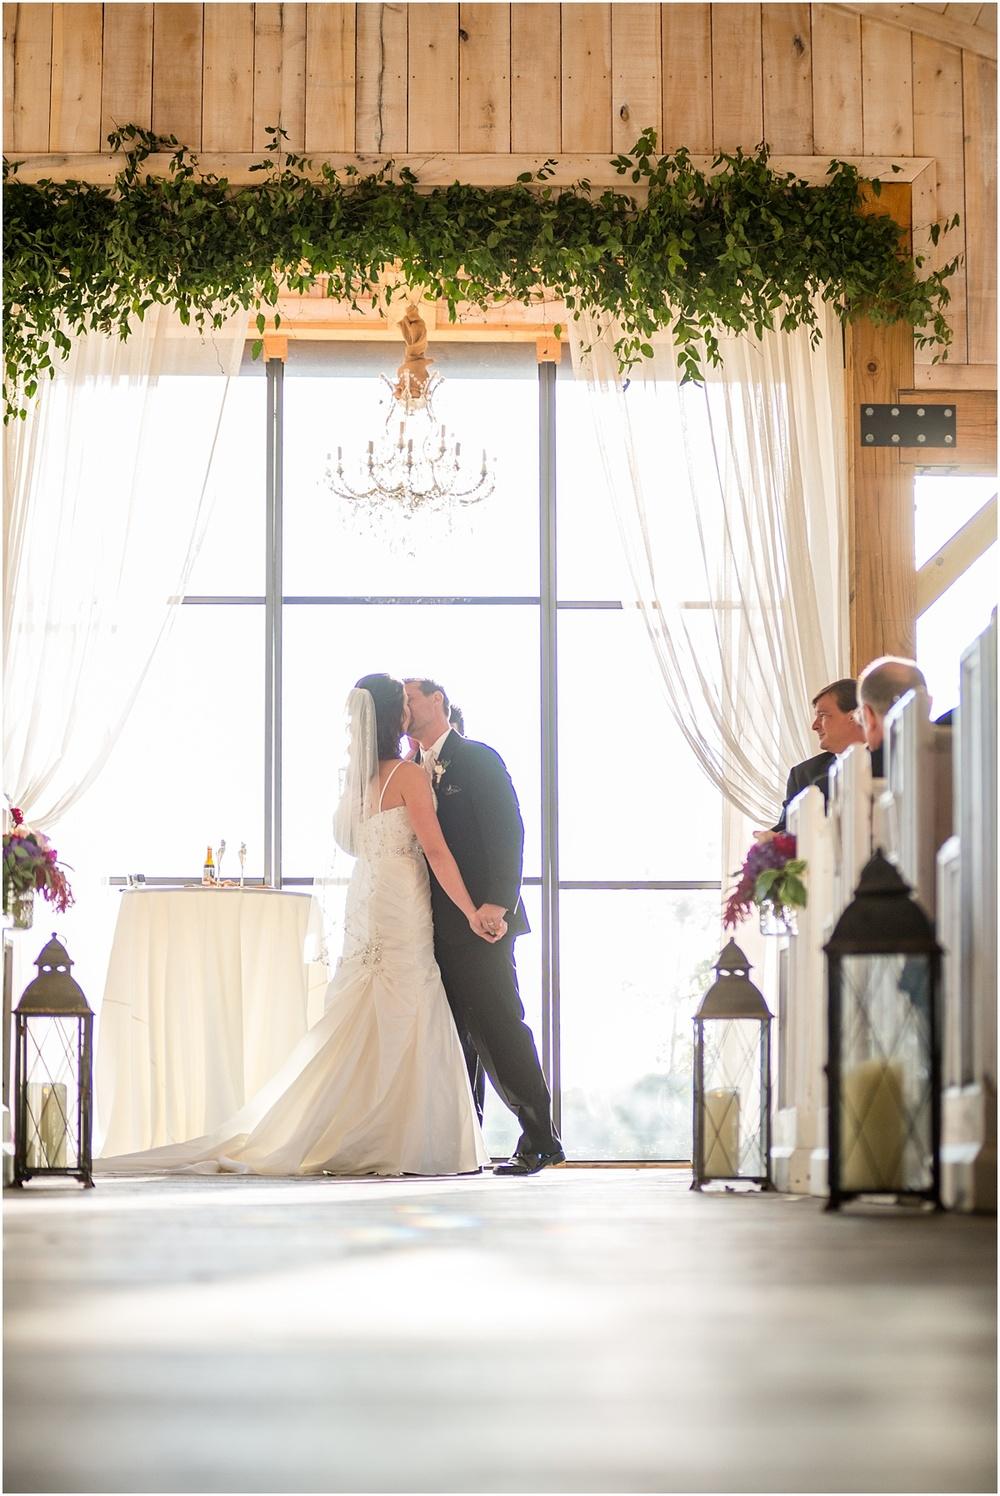 Greg Smit Photography Nashville wedding photographer Mint Springs Farm_0163